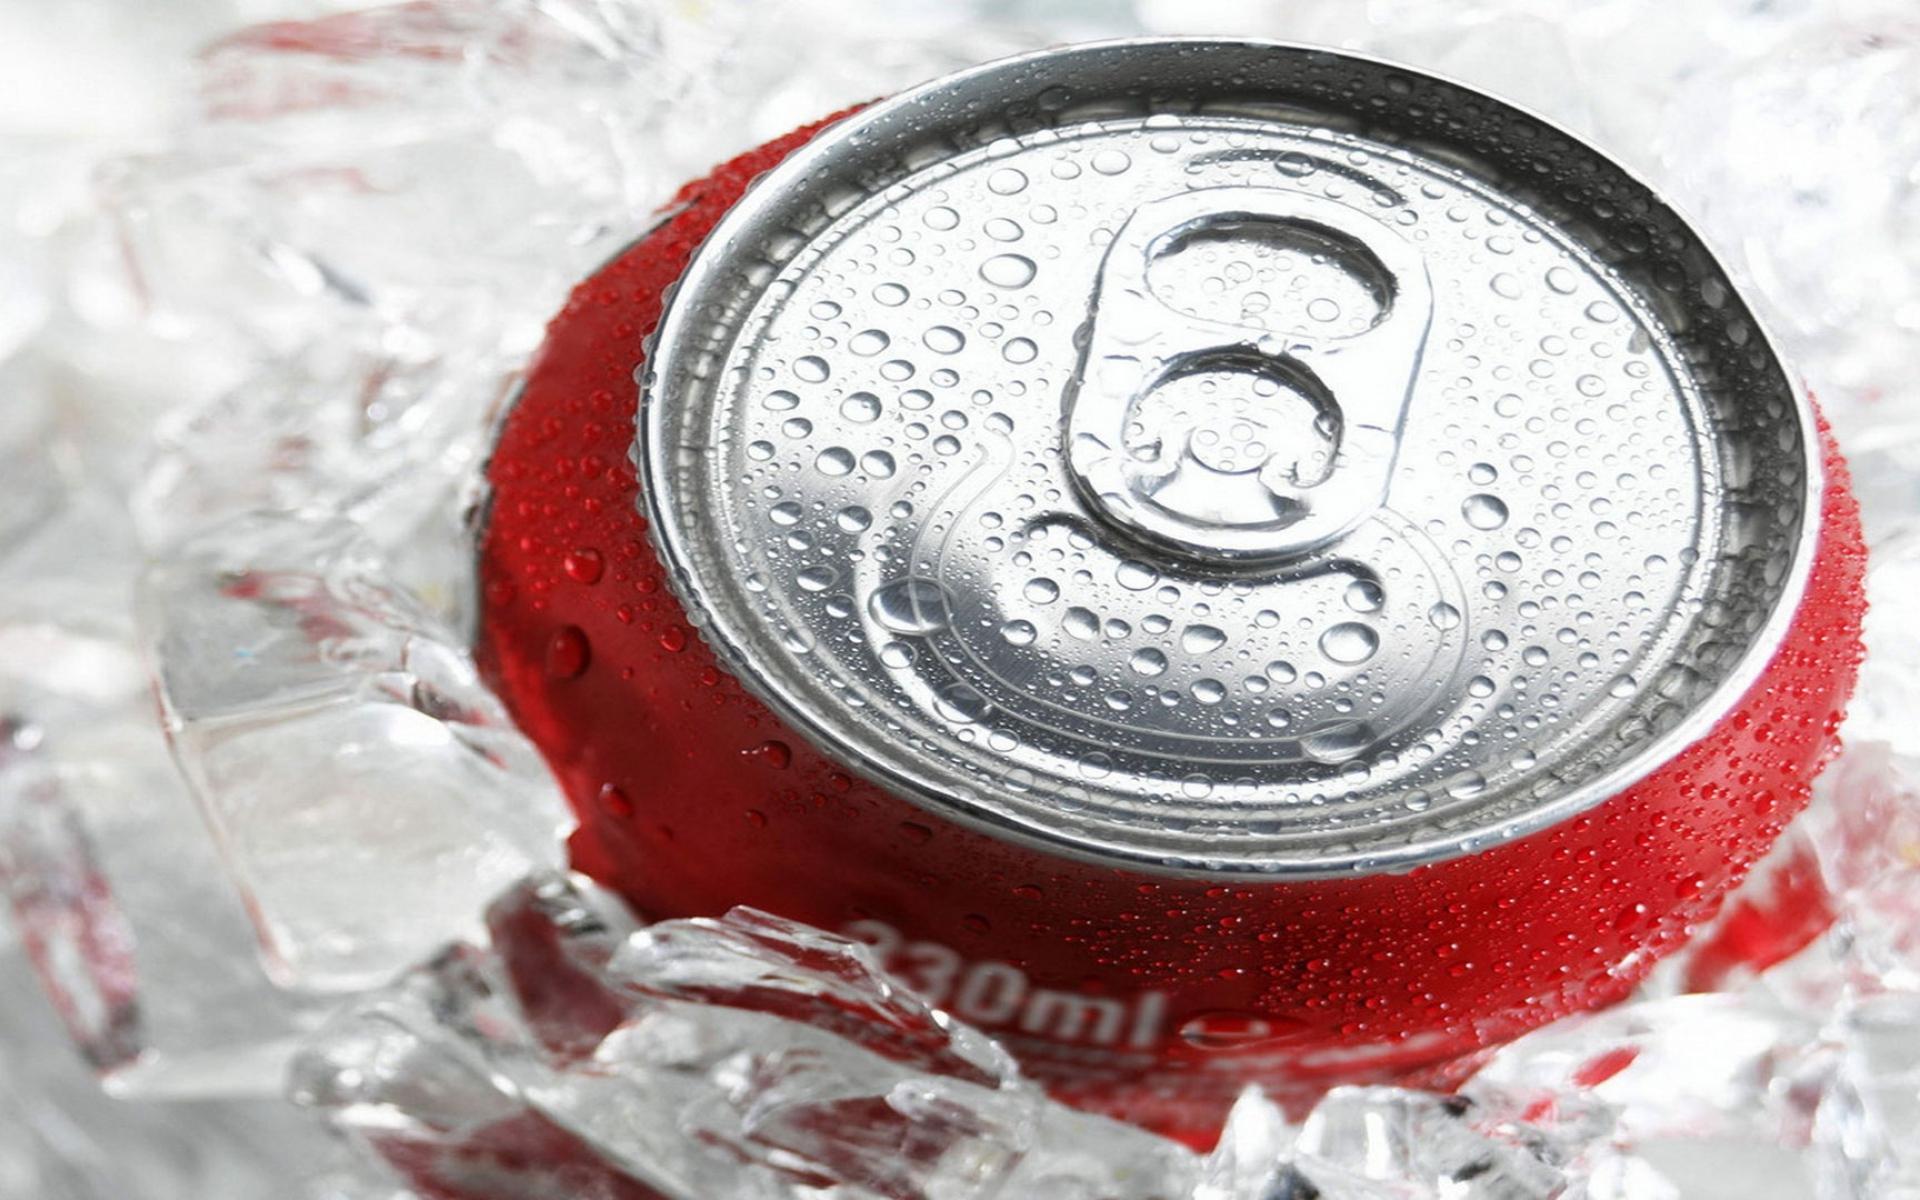 Картинки Кока-кола, пить, лед, банк фото и обои на рабочий стол